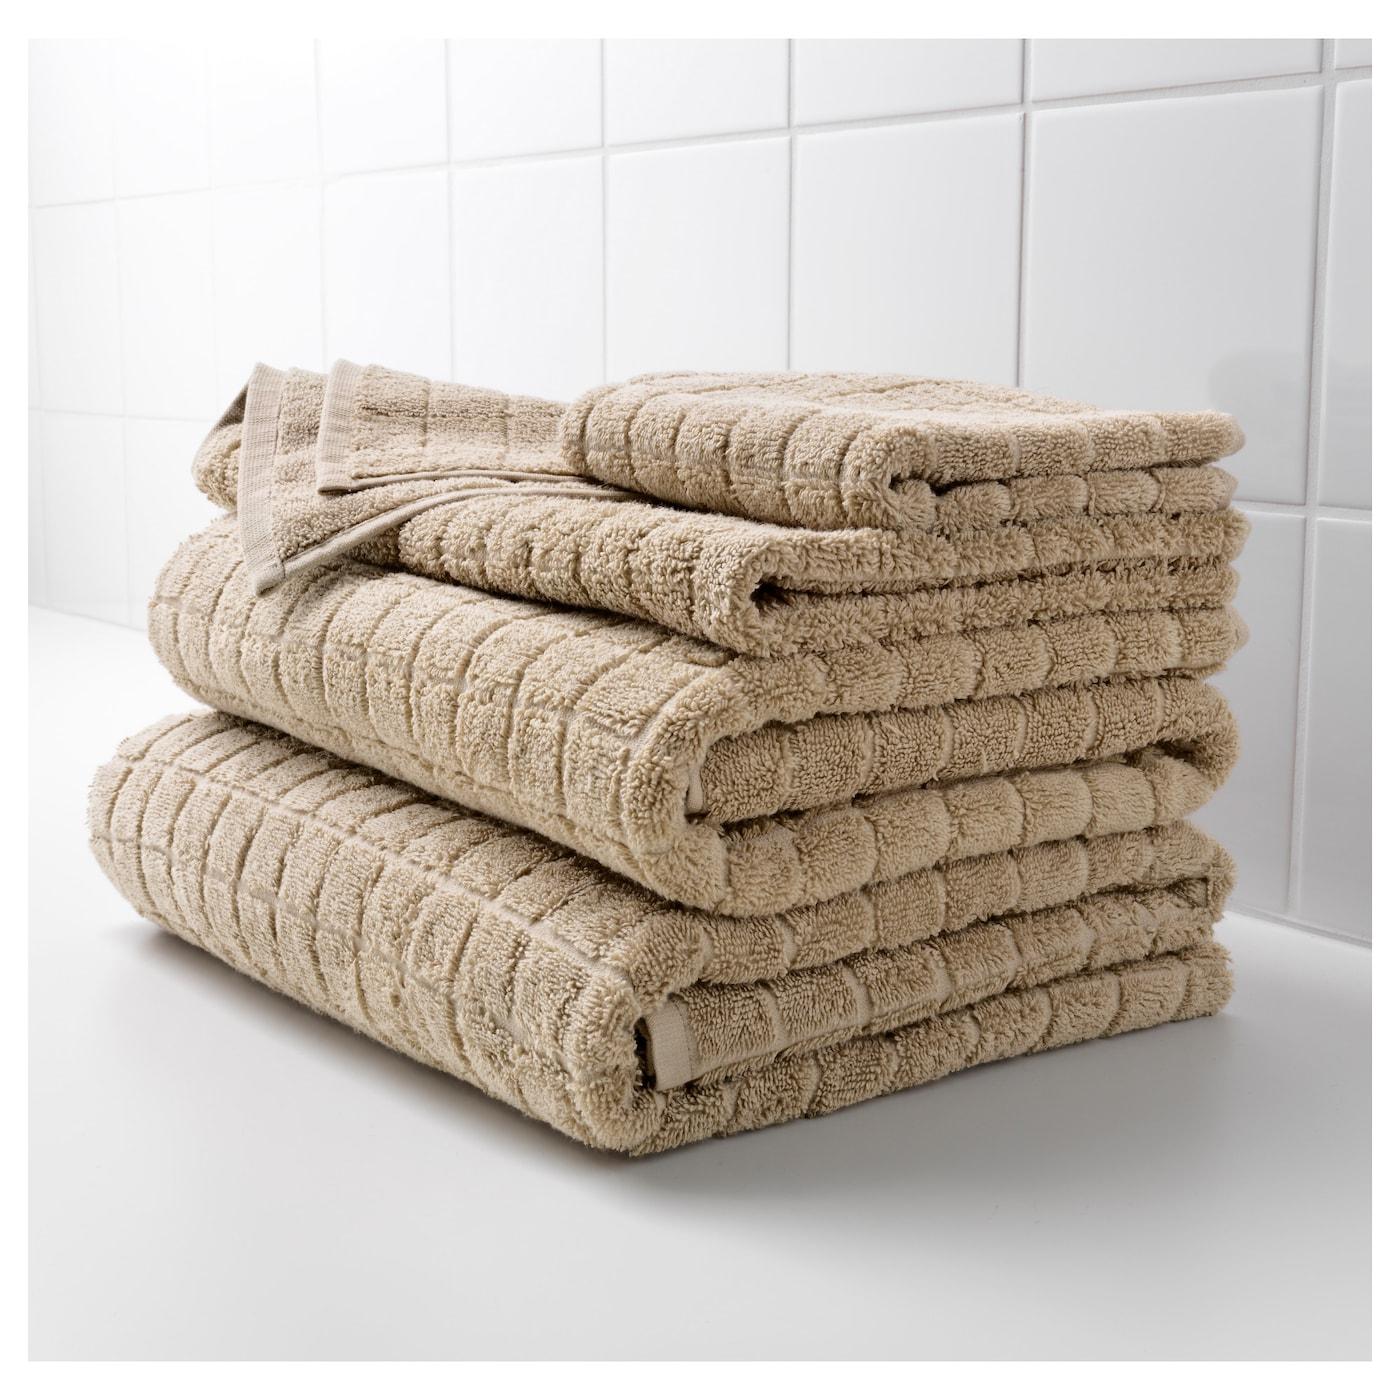 fj rden badhanddoek donkerbeige 70x140 cm ikea. Black Bedroom Furniture Sets. Home Design Ideas